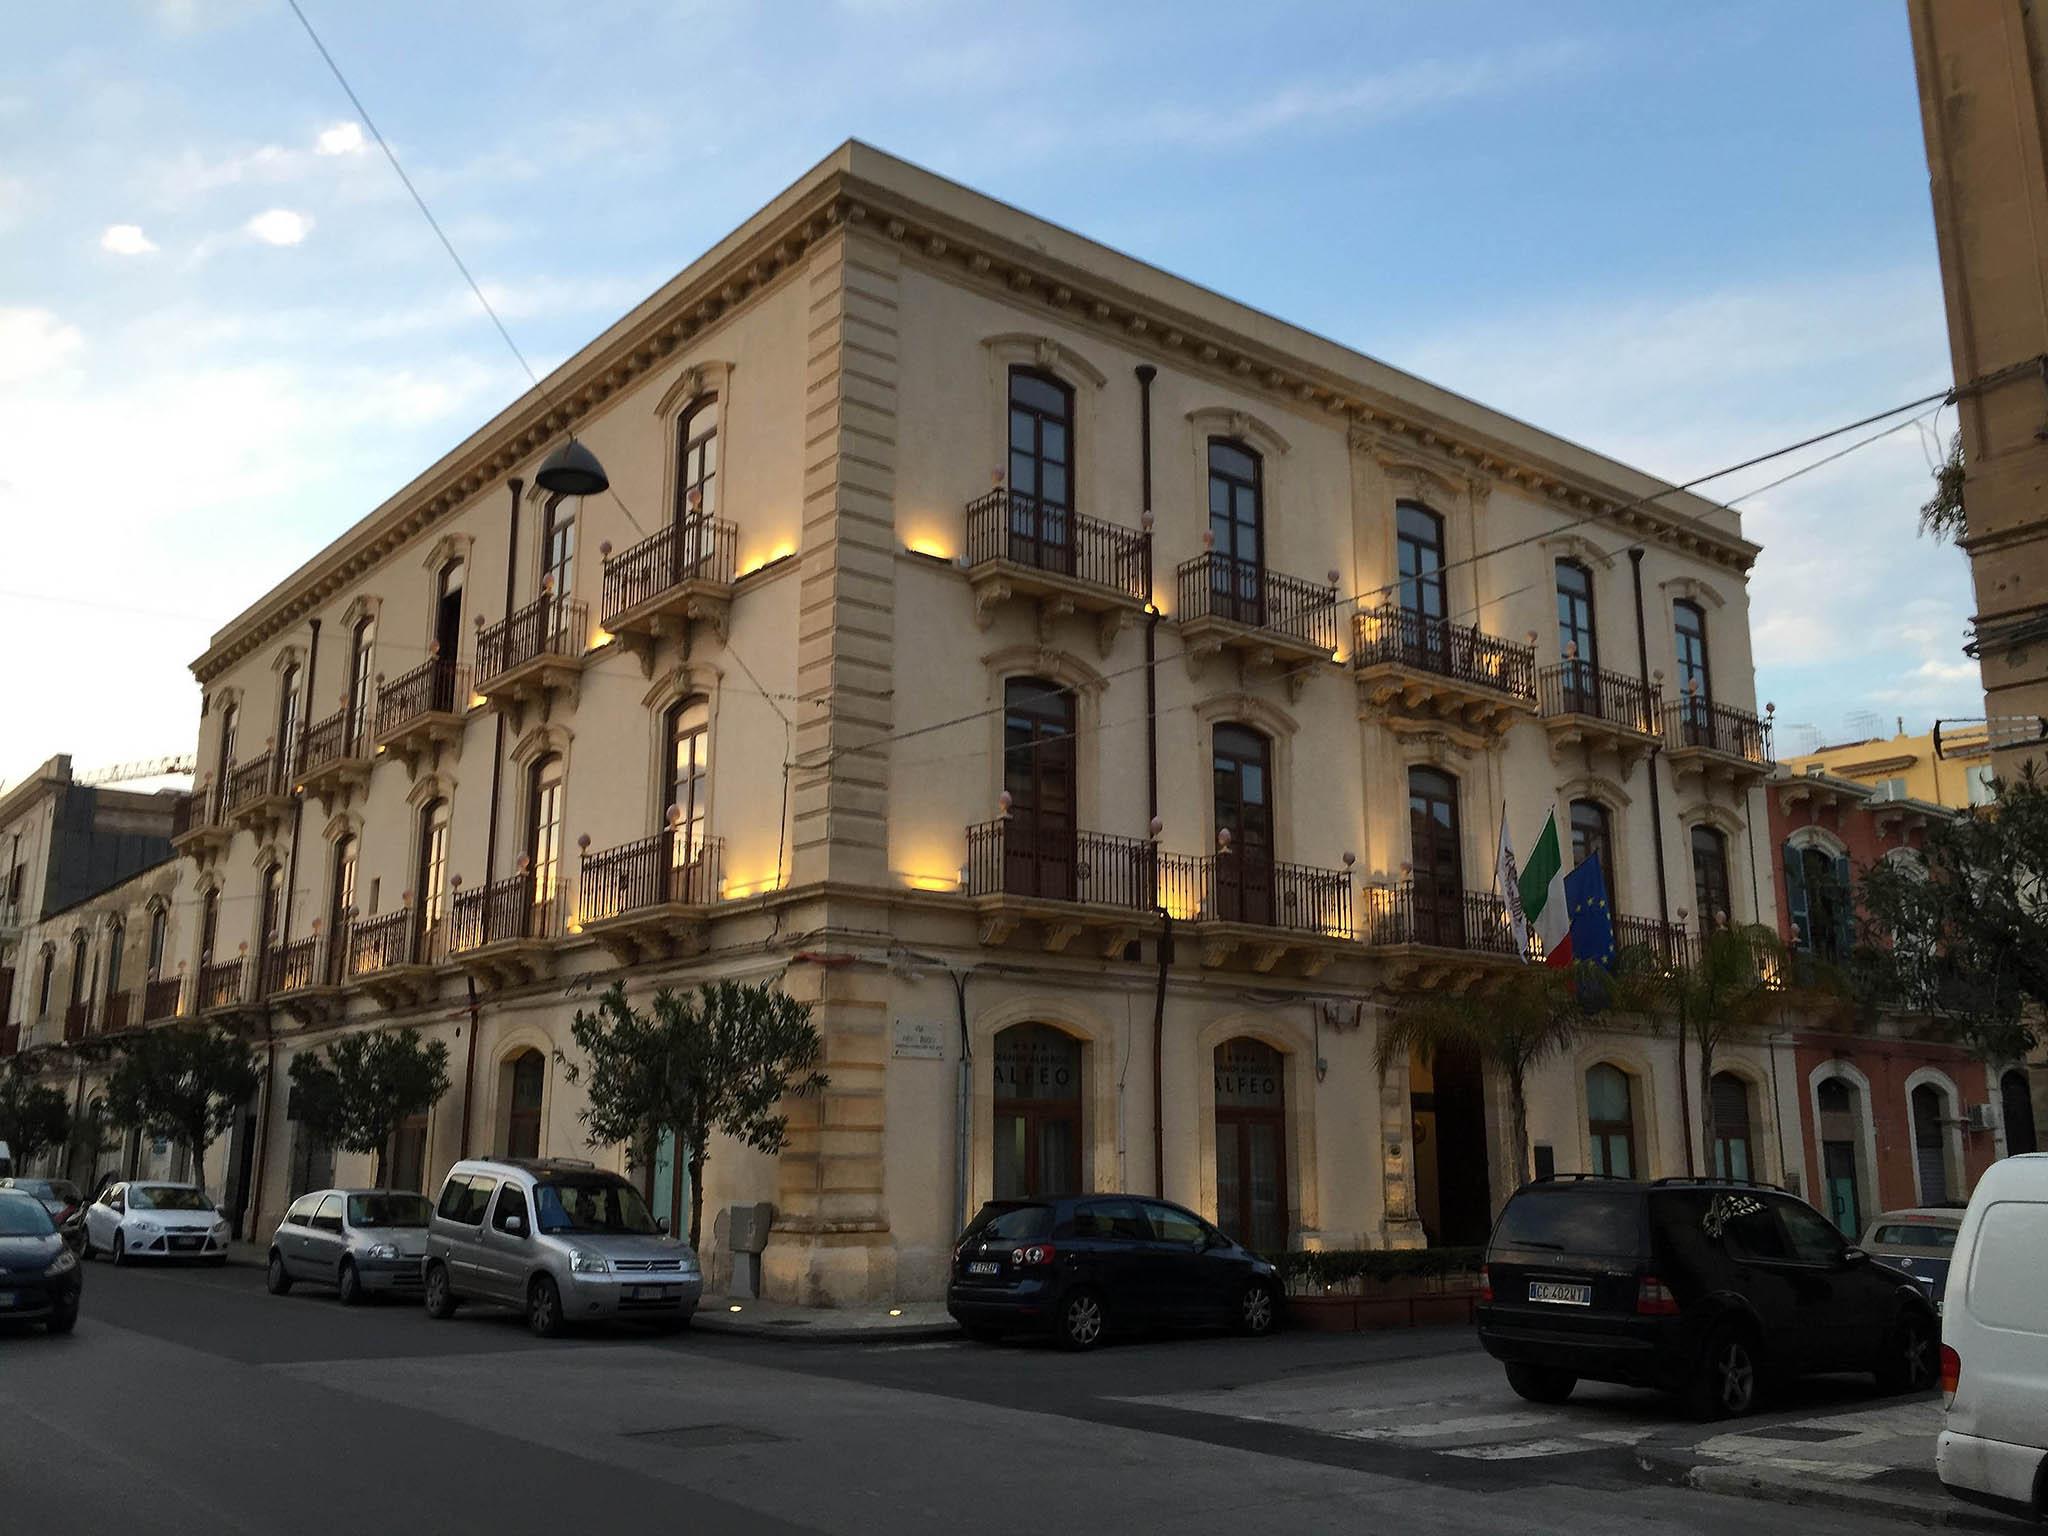 Hotel a siracusa grande albergo alfeo for Hotel siracusa 3 stelle